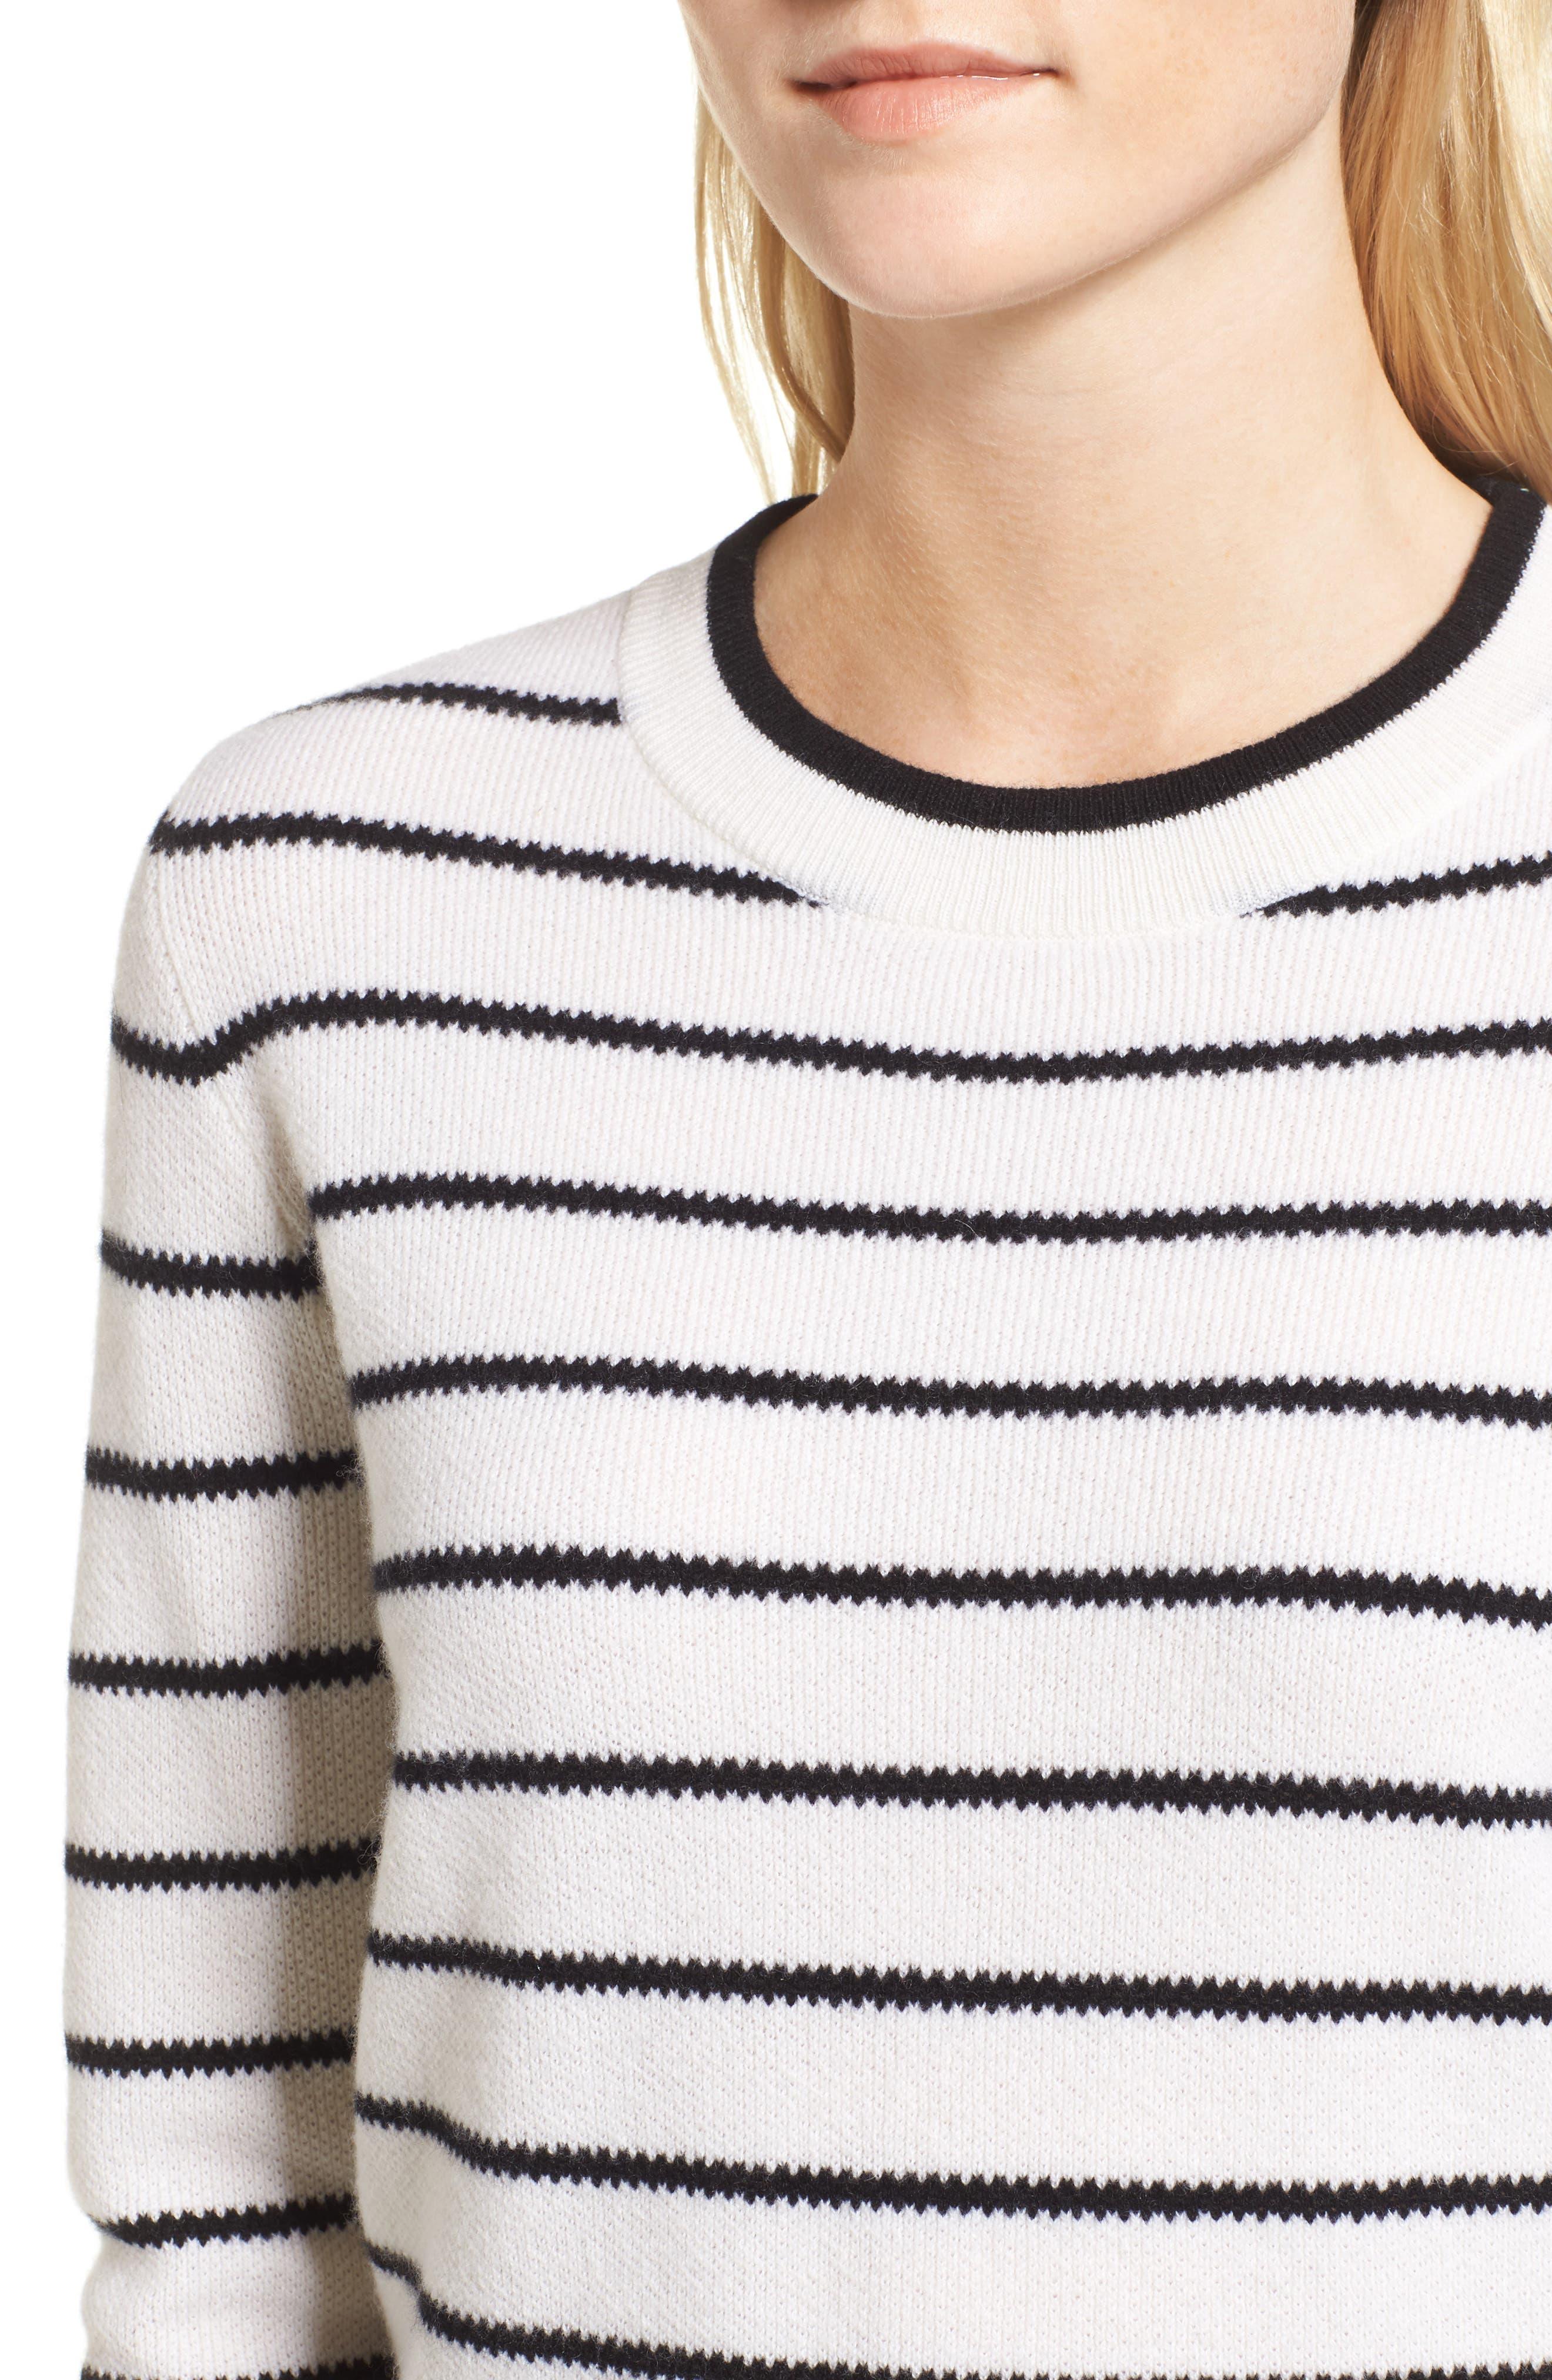 Stripe Cashmere Sweater,                             Alternate thumbnail 7, color,                             Ivory- Black Stripe